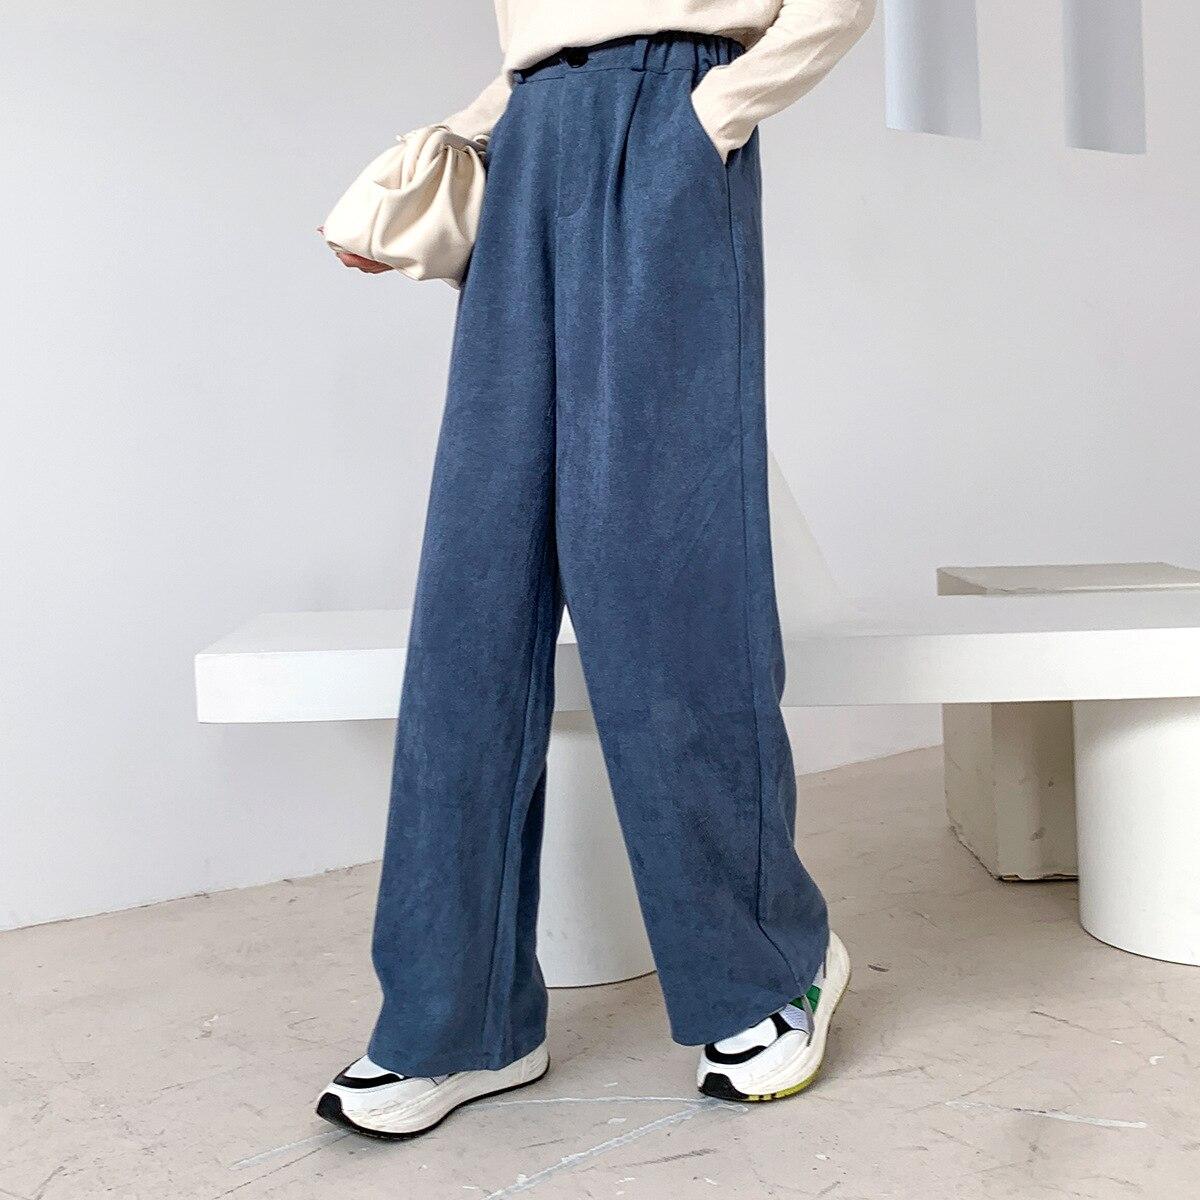 Sherhure 2020 Women Spring Pants Pure Color Stretch Waist Women Wide Leg Straight Pants Fashion Women Pants Female Trousers